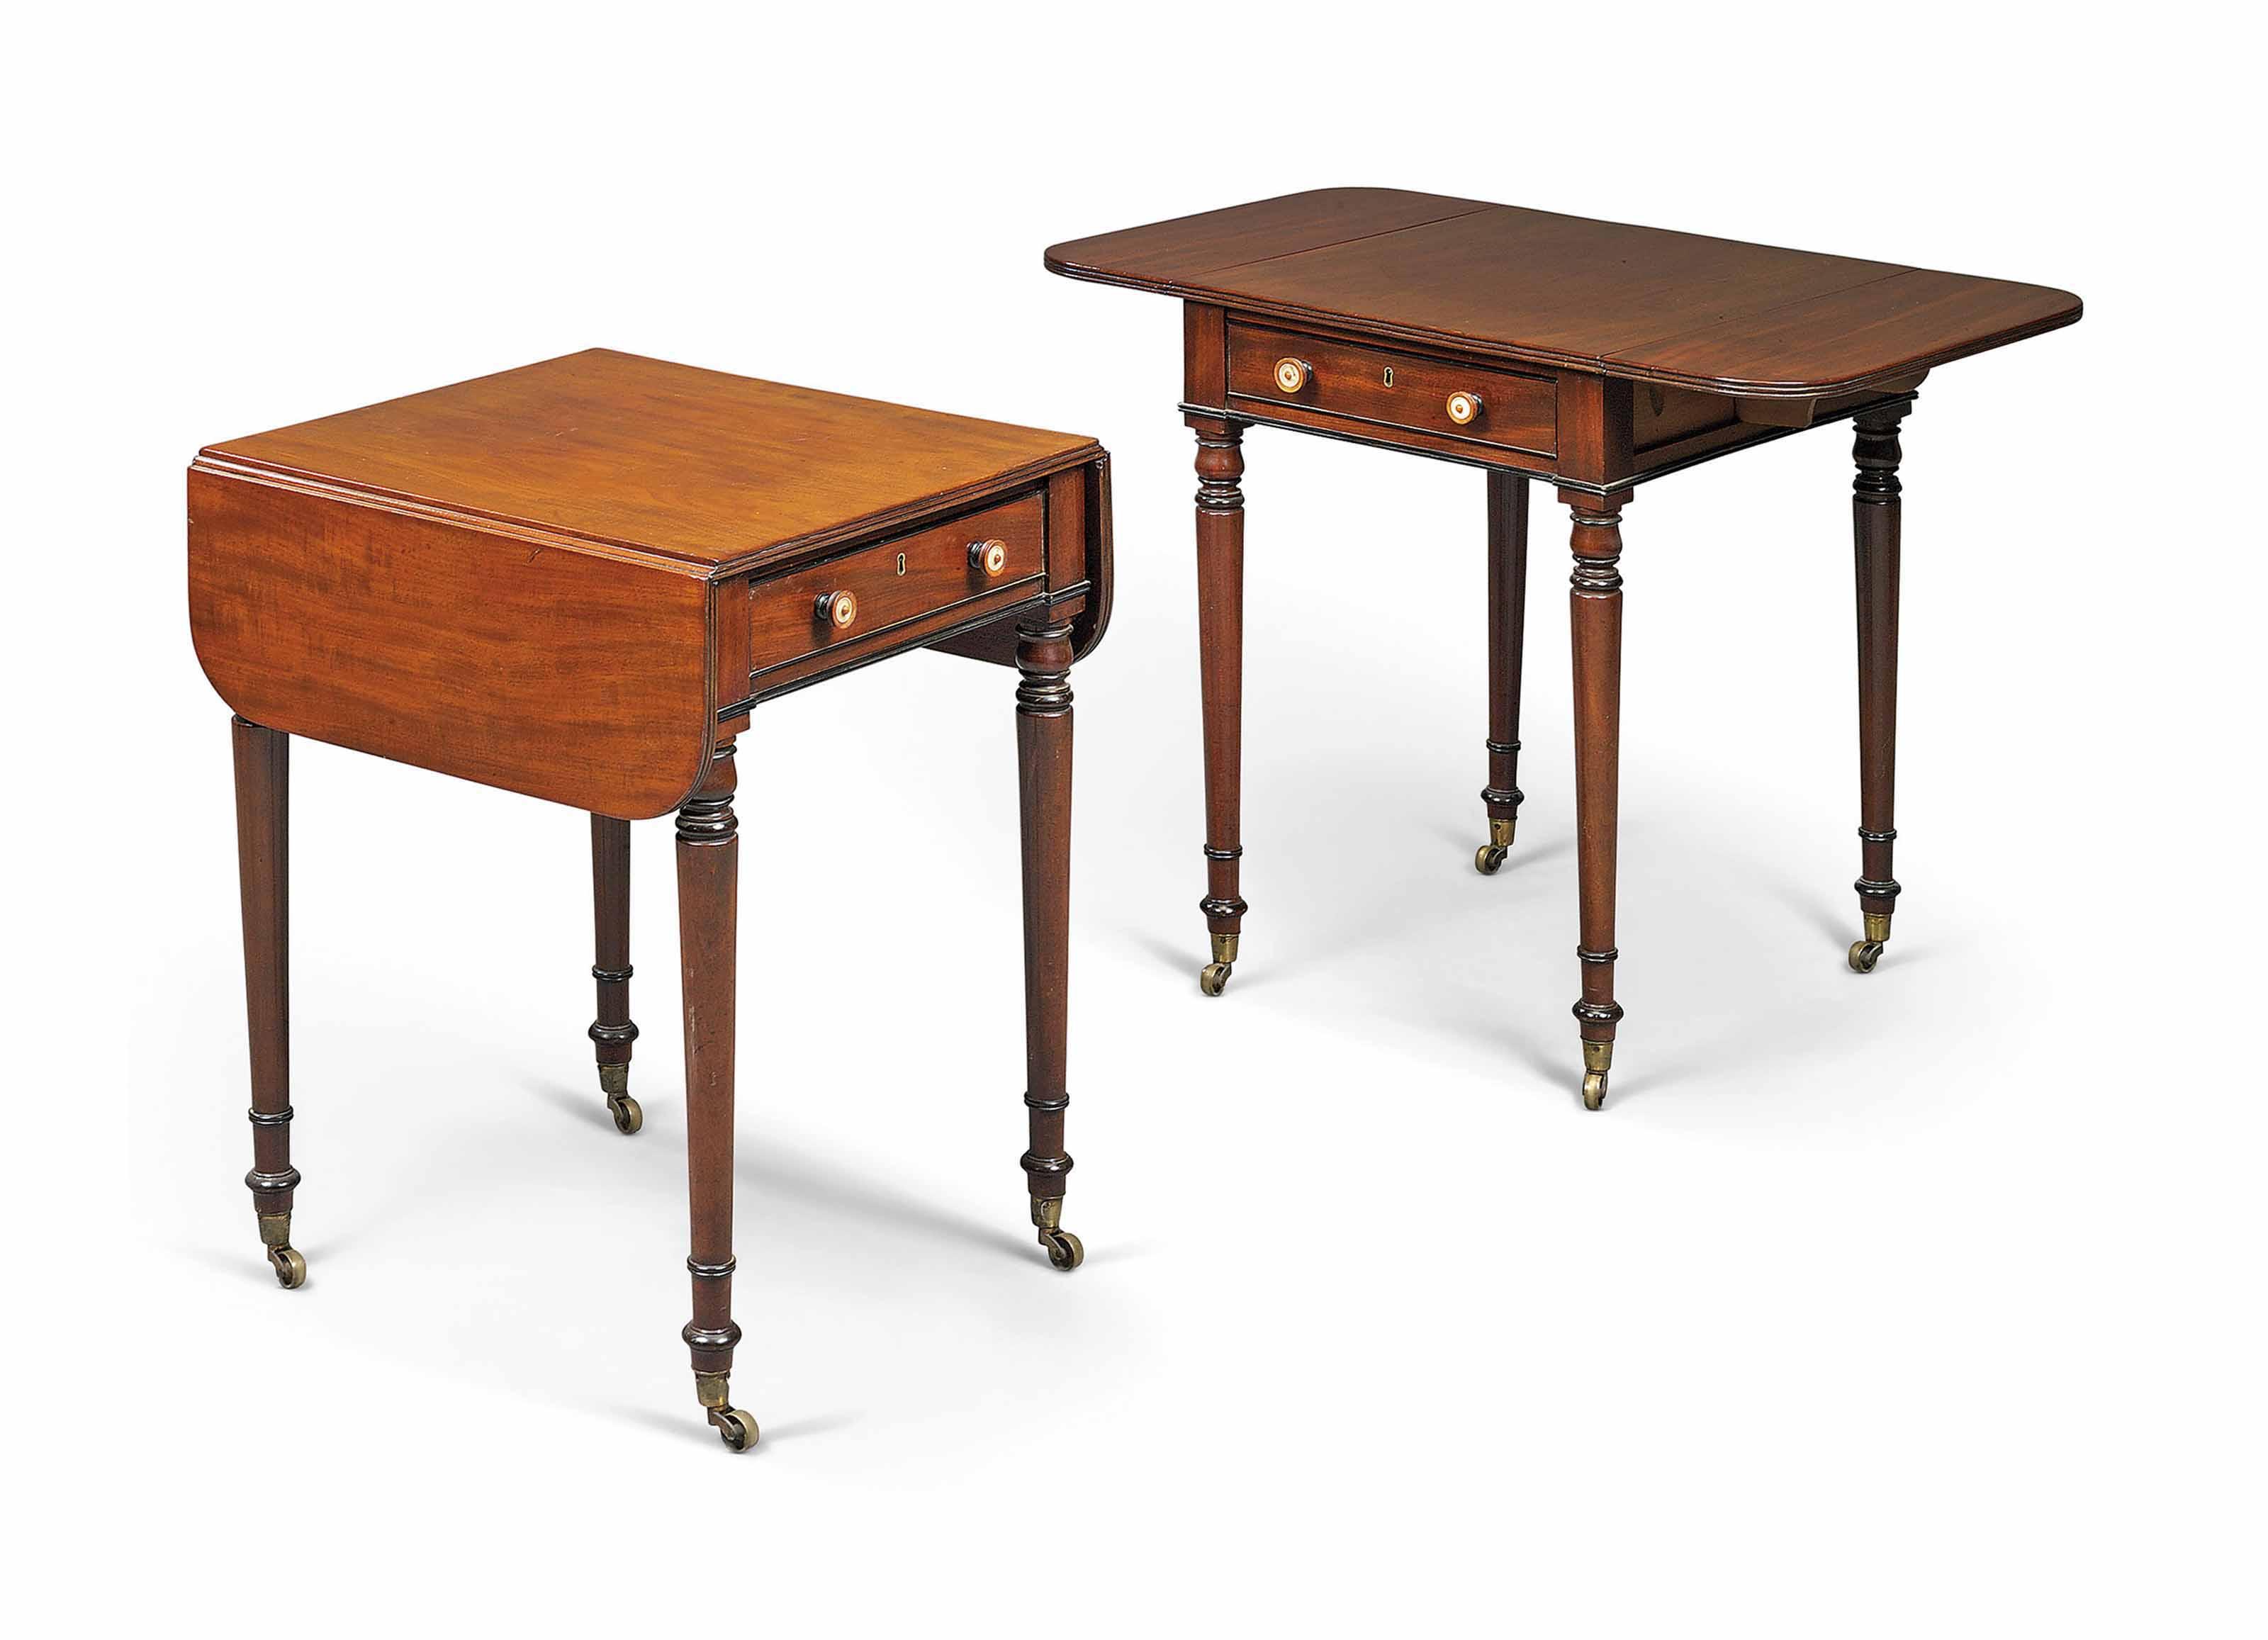 A PAIR OF GEORGE IV MAHOGANY, EBONY AND EBONISED PEMBROKE TABLES